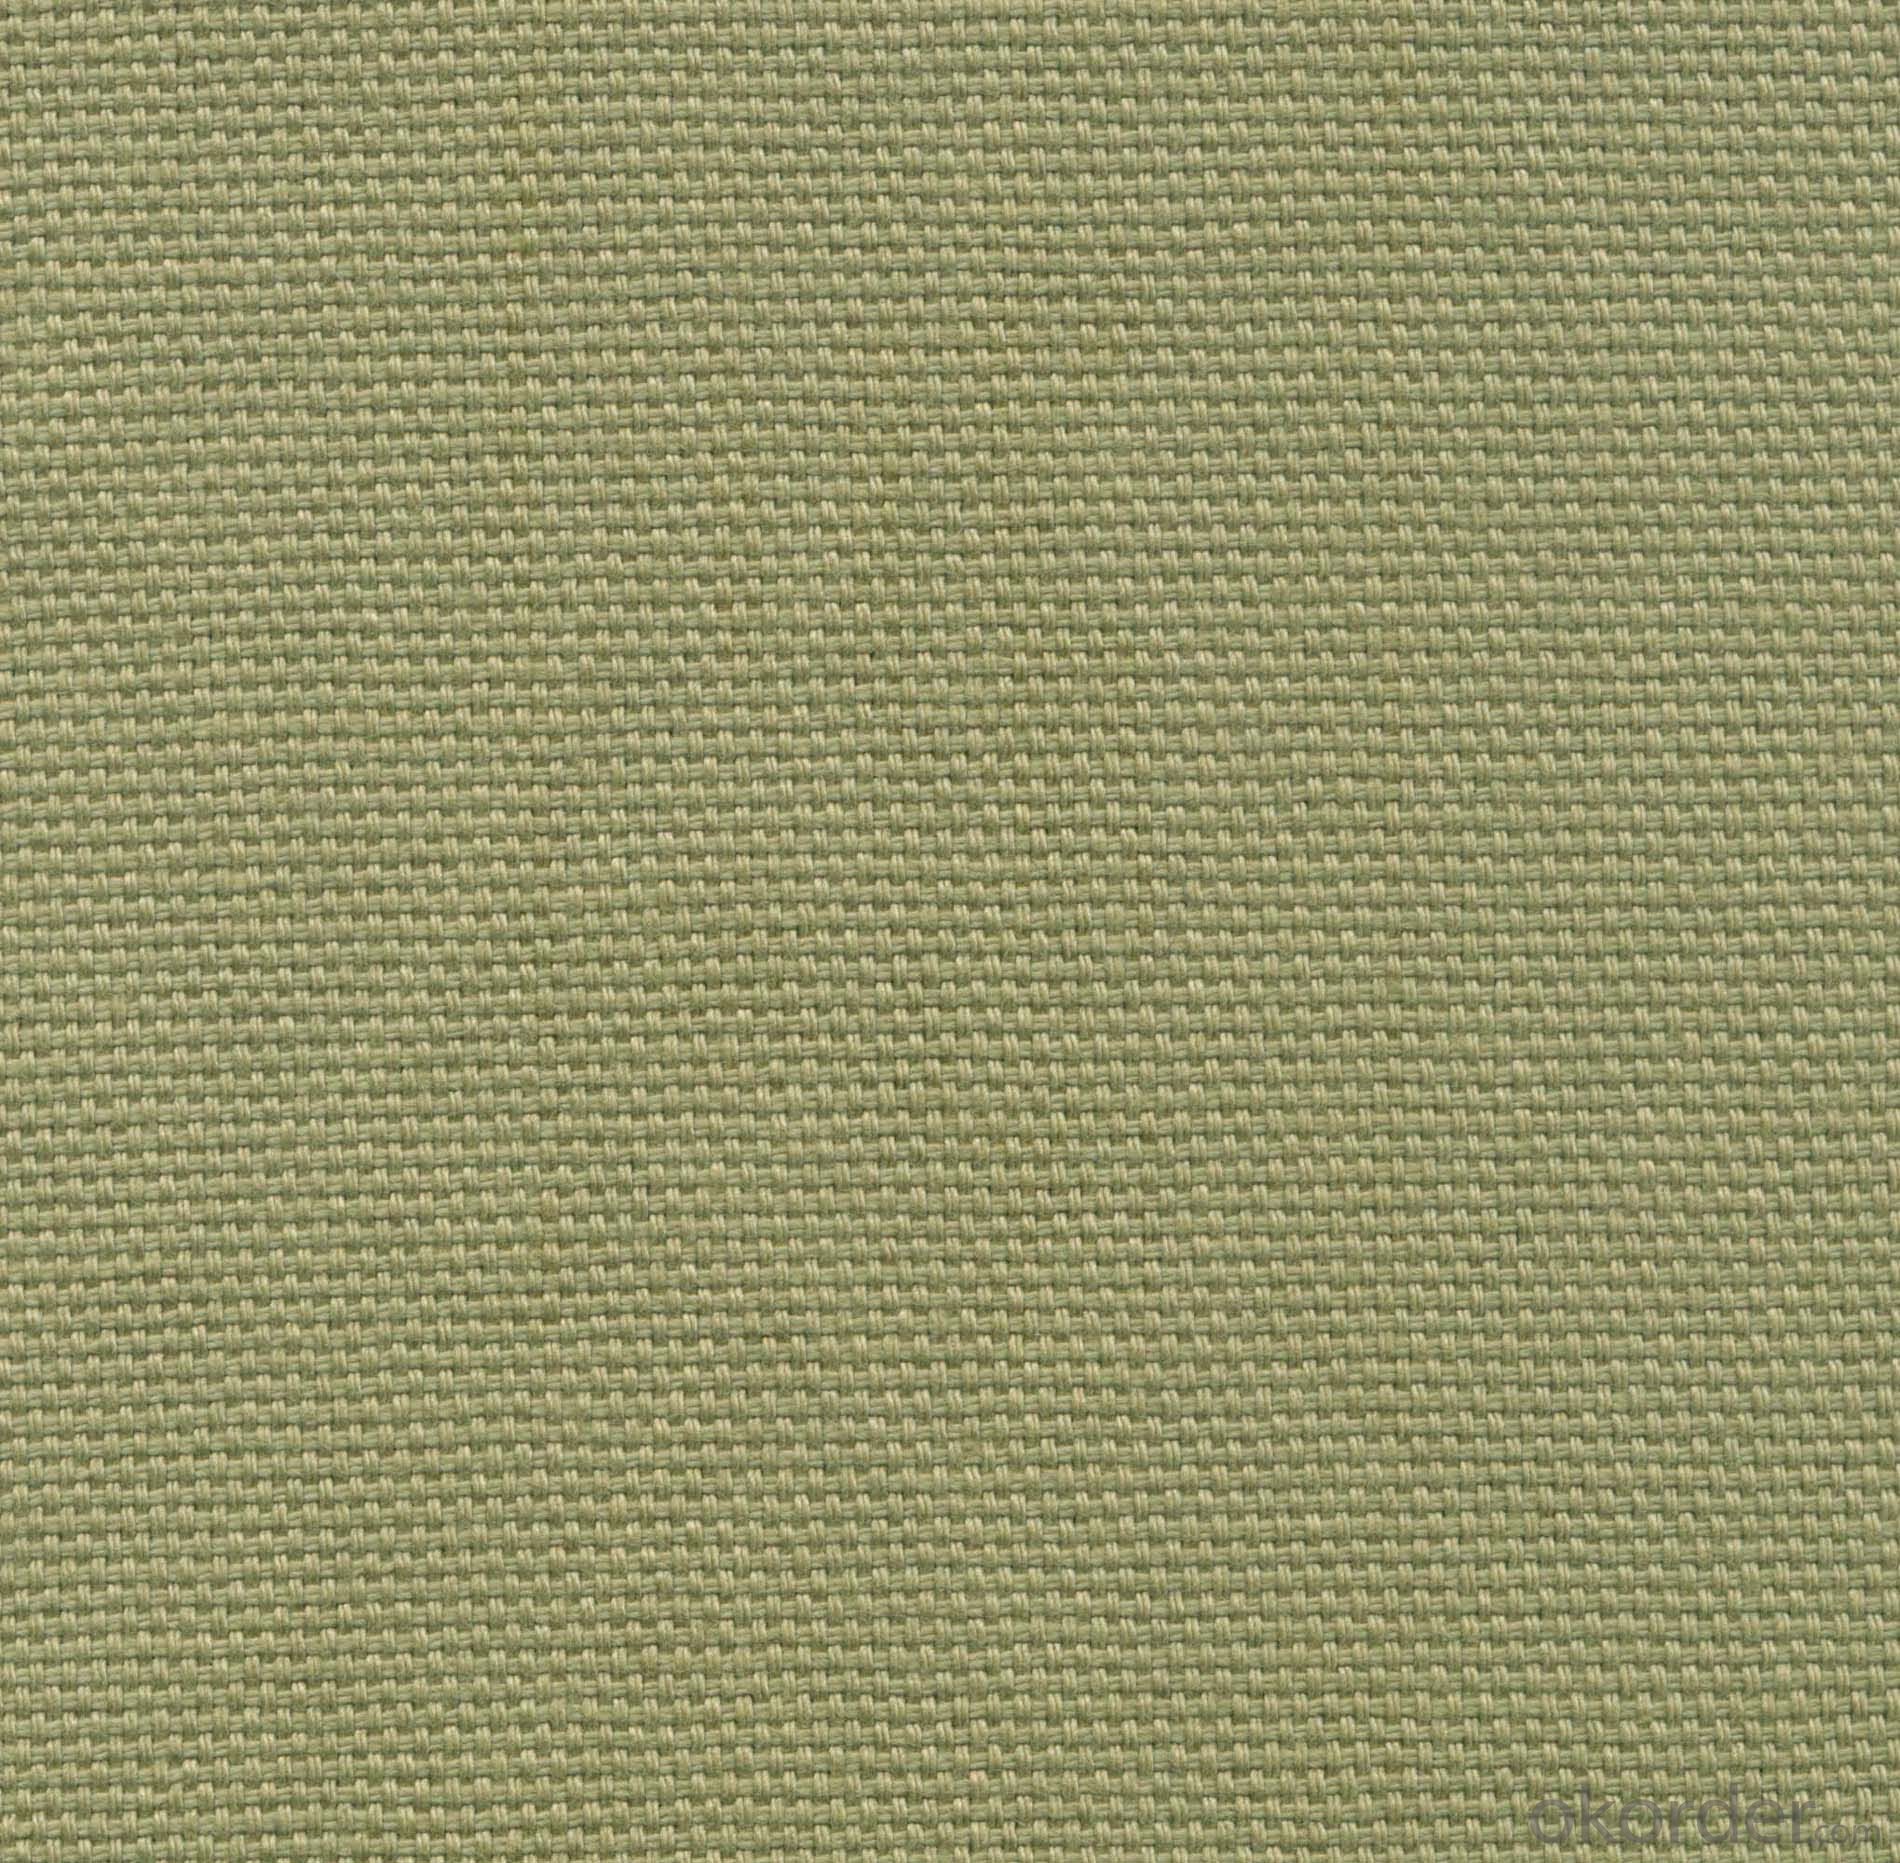 TR SAND-WASH.GABARDINE FABRIC W008/40/2x300D 108x56